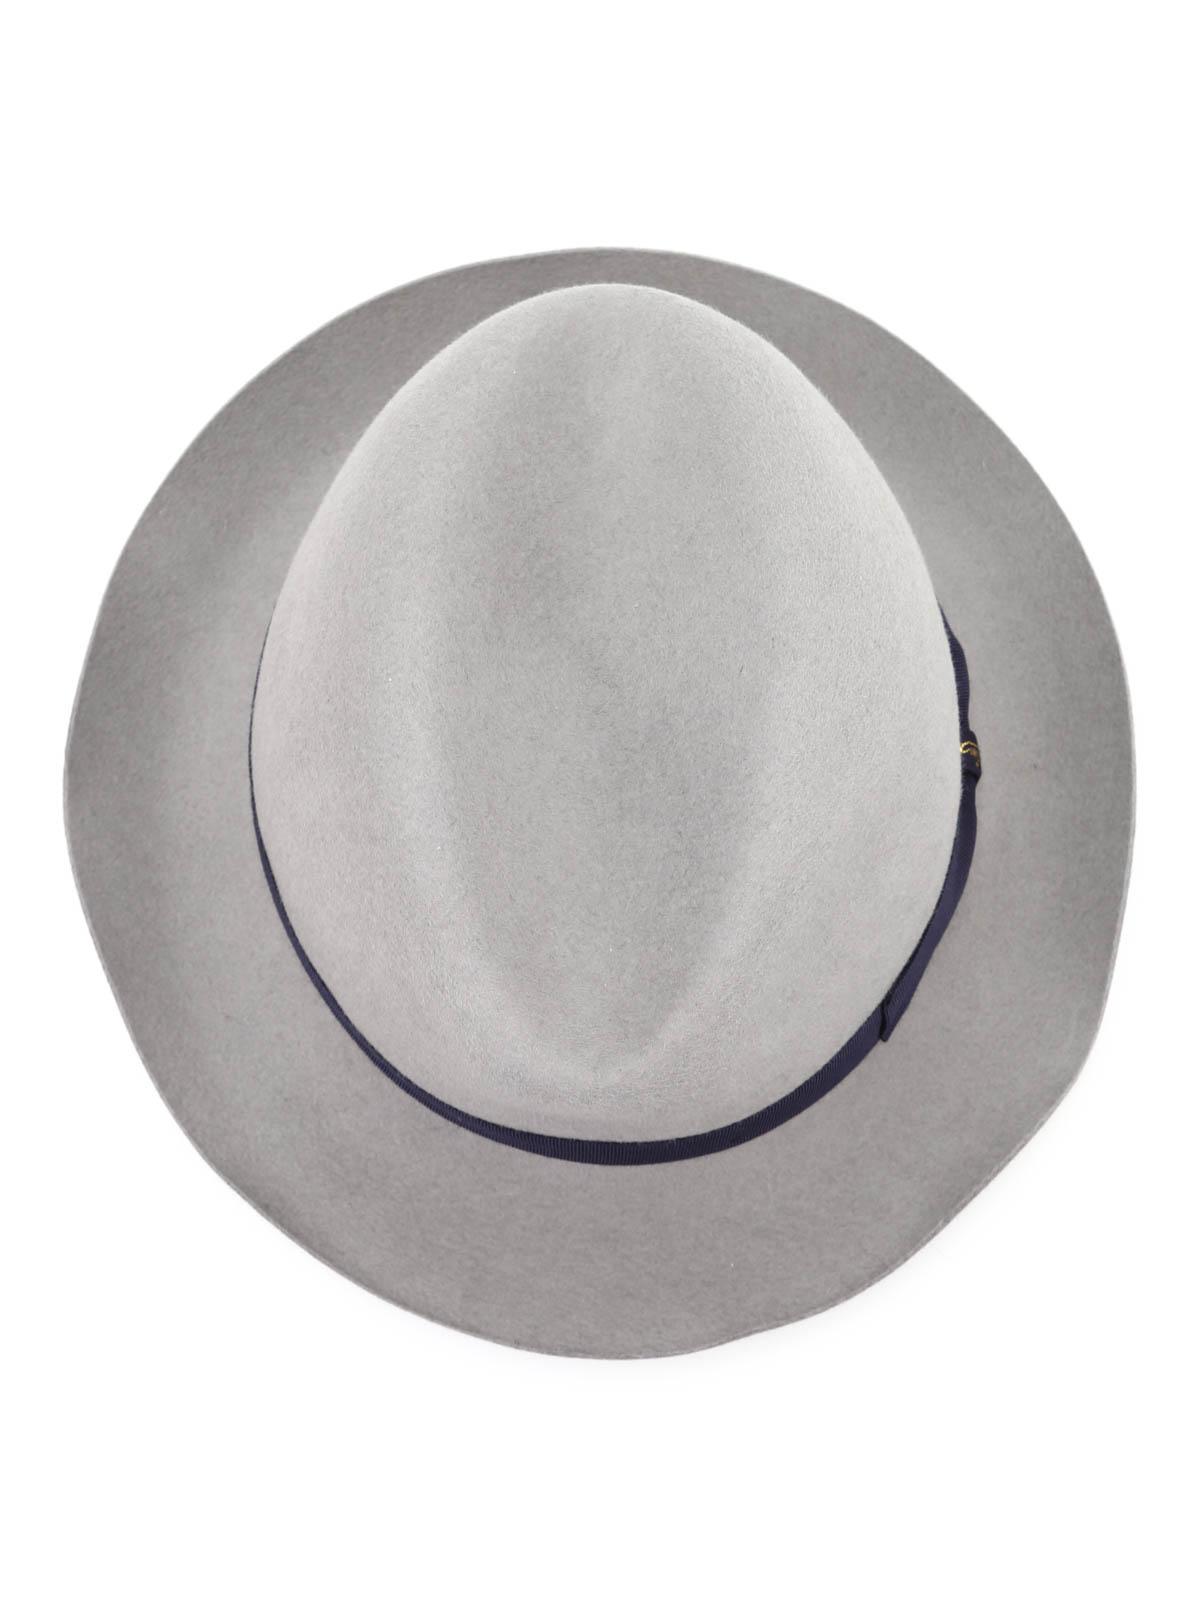 Borsalino - Alessandria felt hat - hats   caps - 16 0222 0522 ... 839dded982c